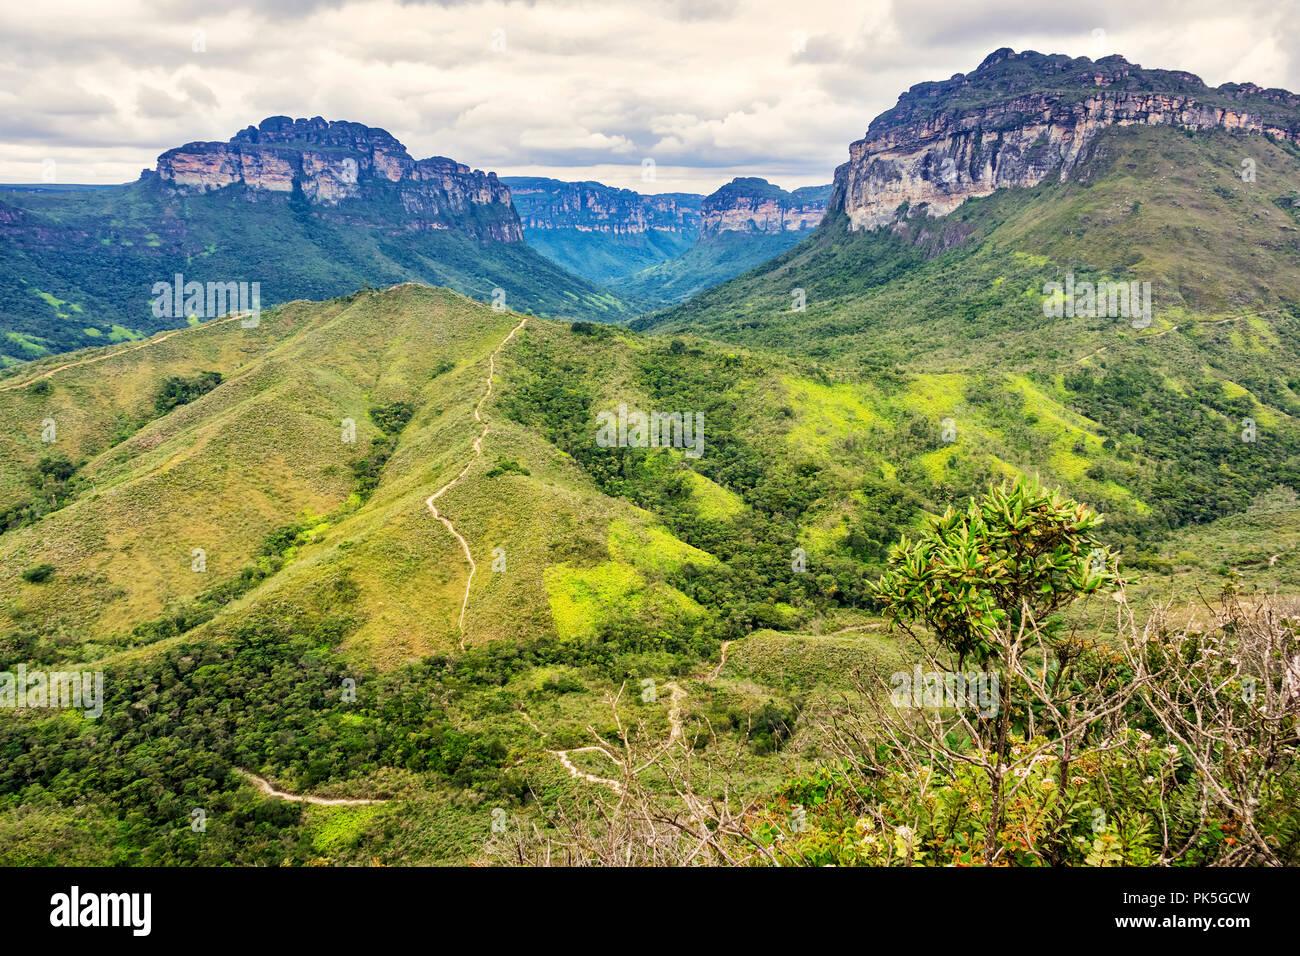 Chapada Diamantina National Park in Bahia state, Brazil - Stock Image